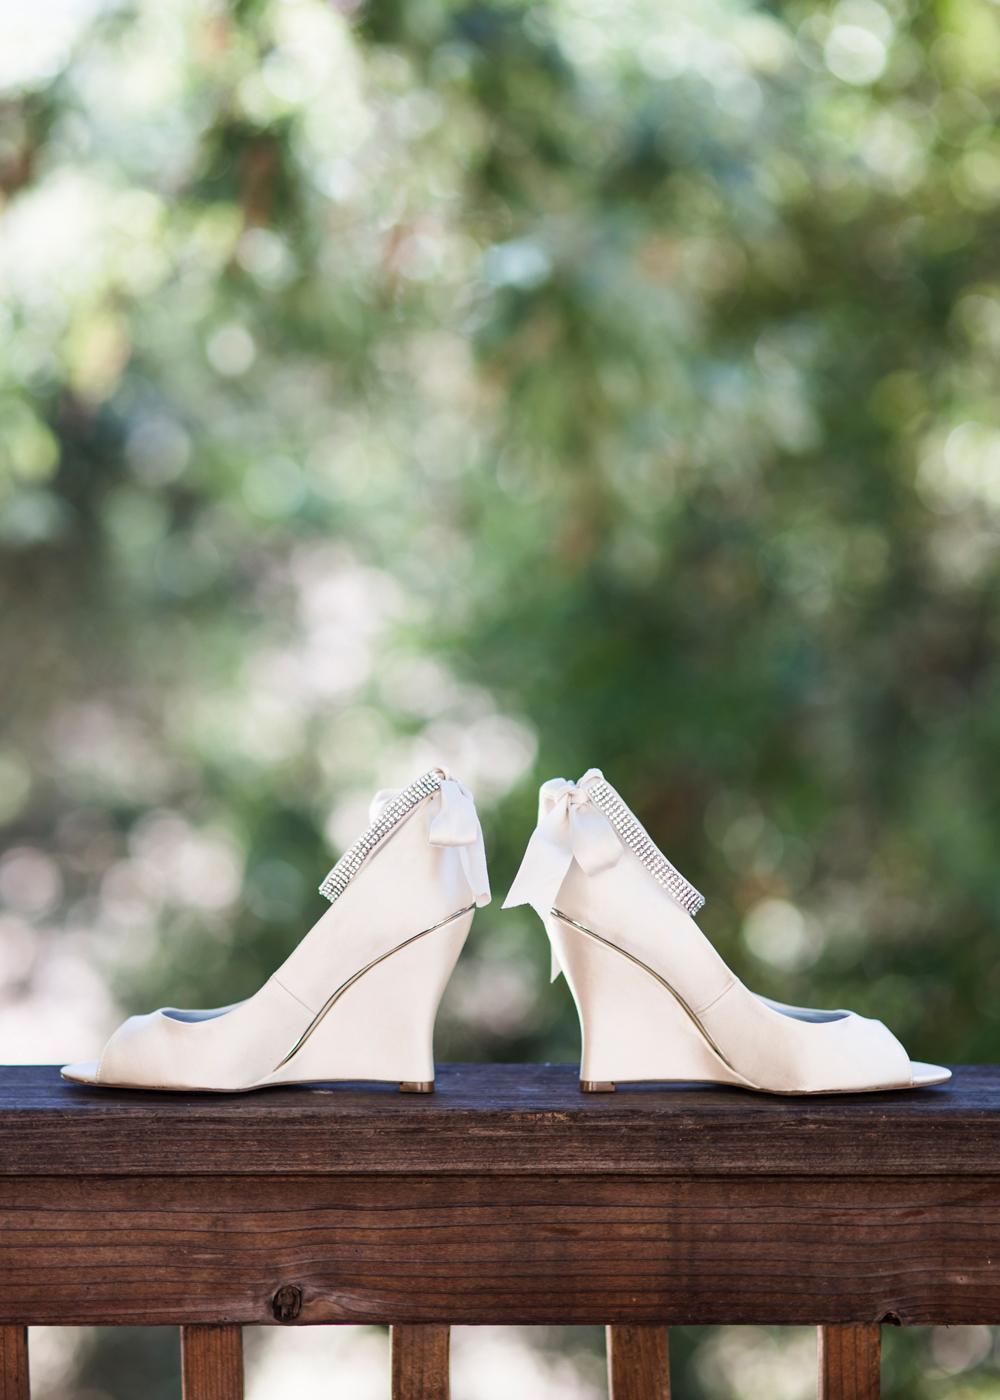 pema-osel-ling-santa-cruz-wedding-photography-lilouette-05.jpg